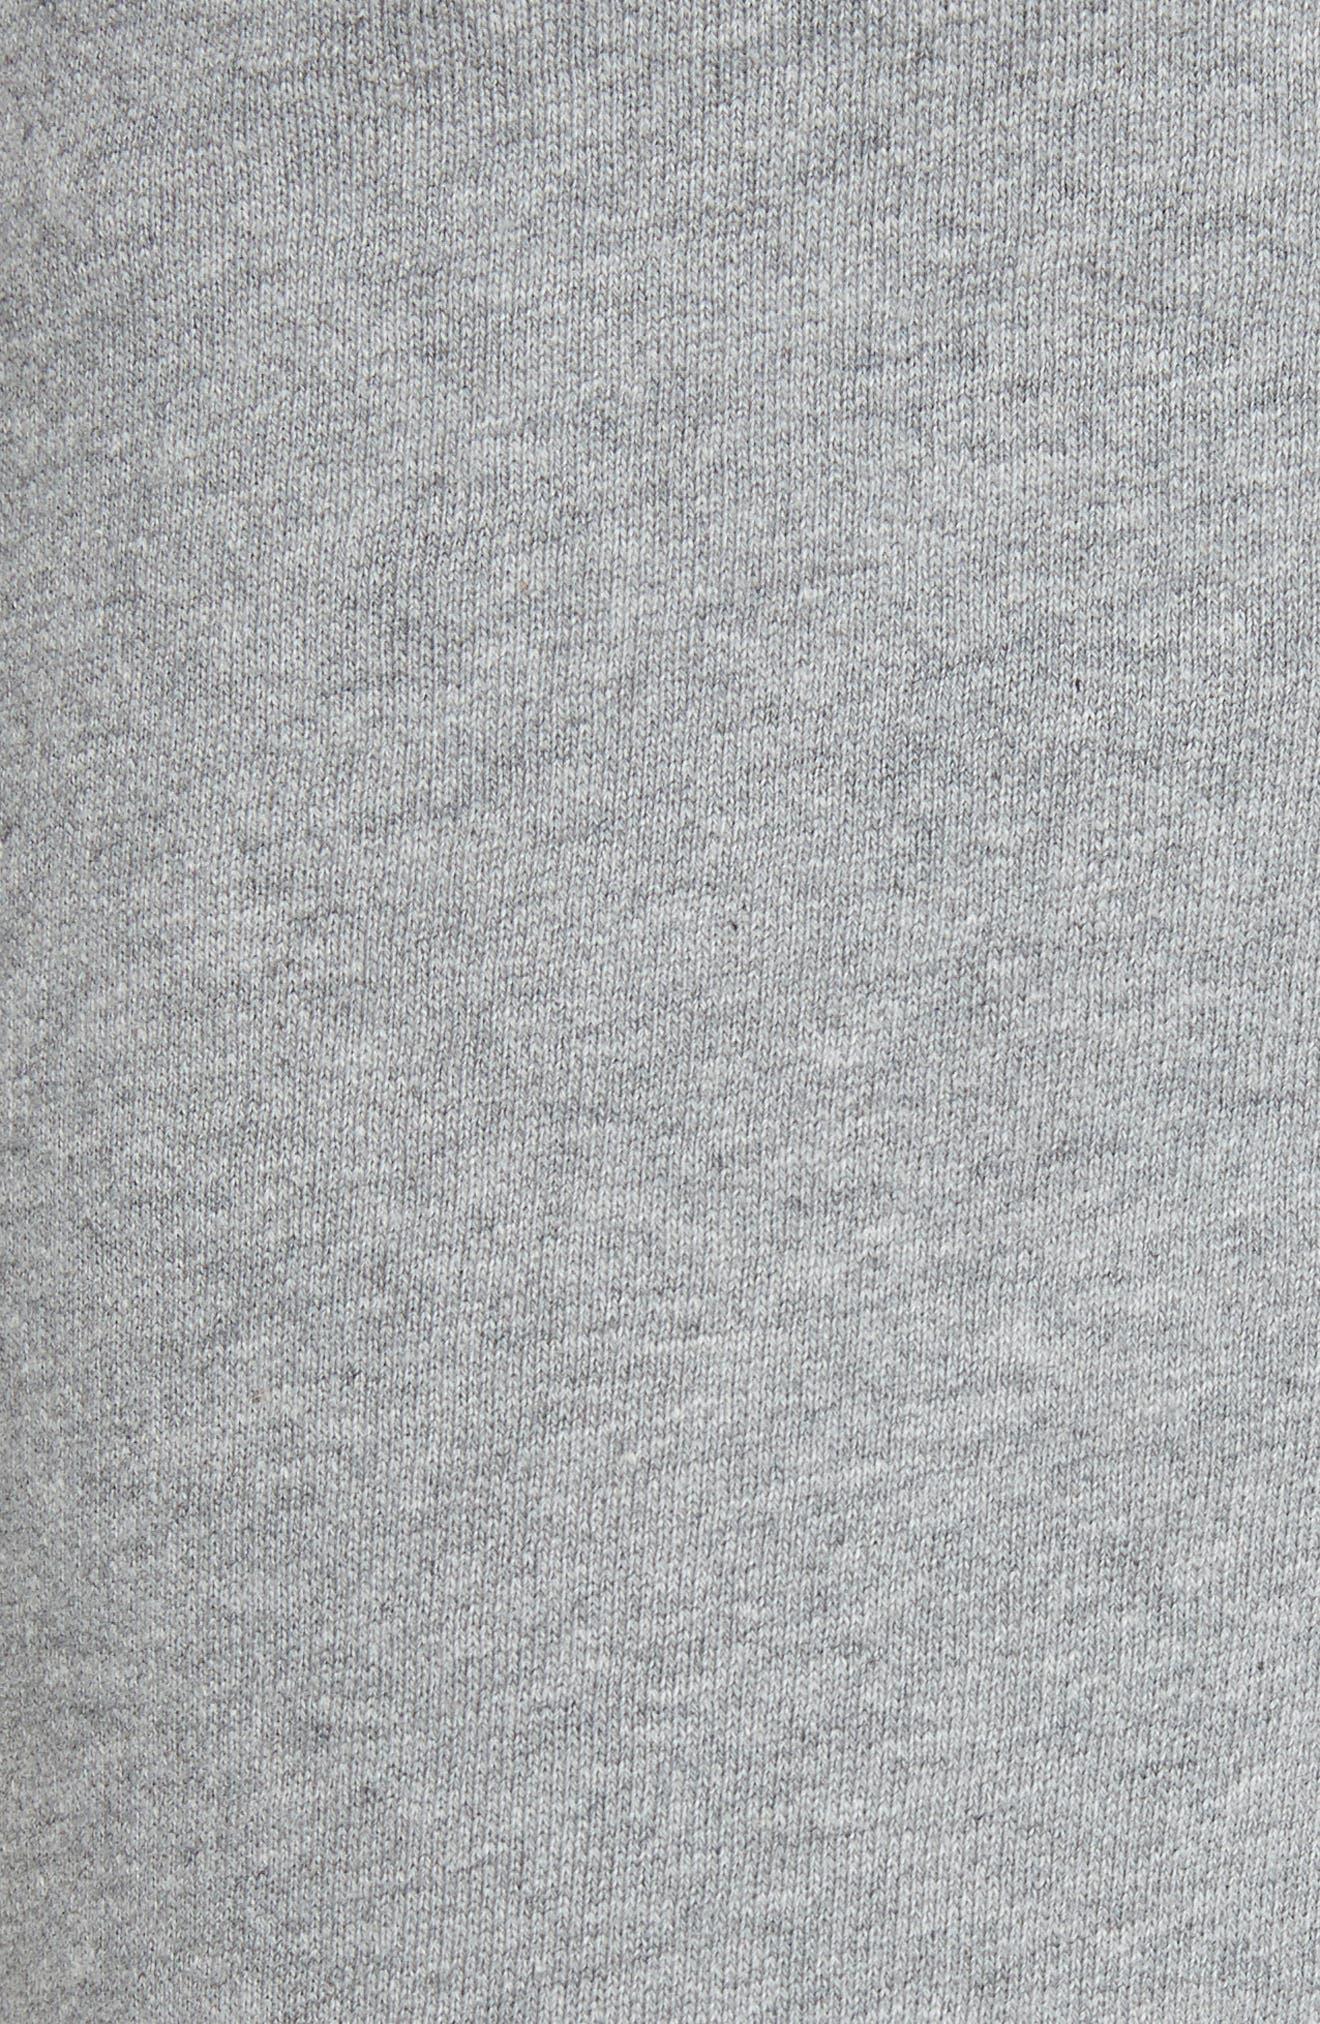 Nickford Lounge Pants,                             Alternate thumbnail 5, color,                             Pale Grey Melange